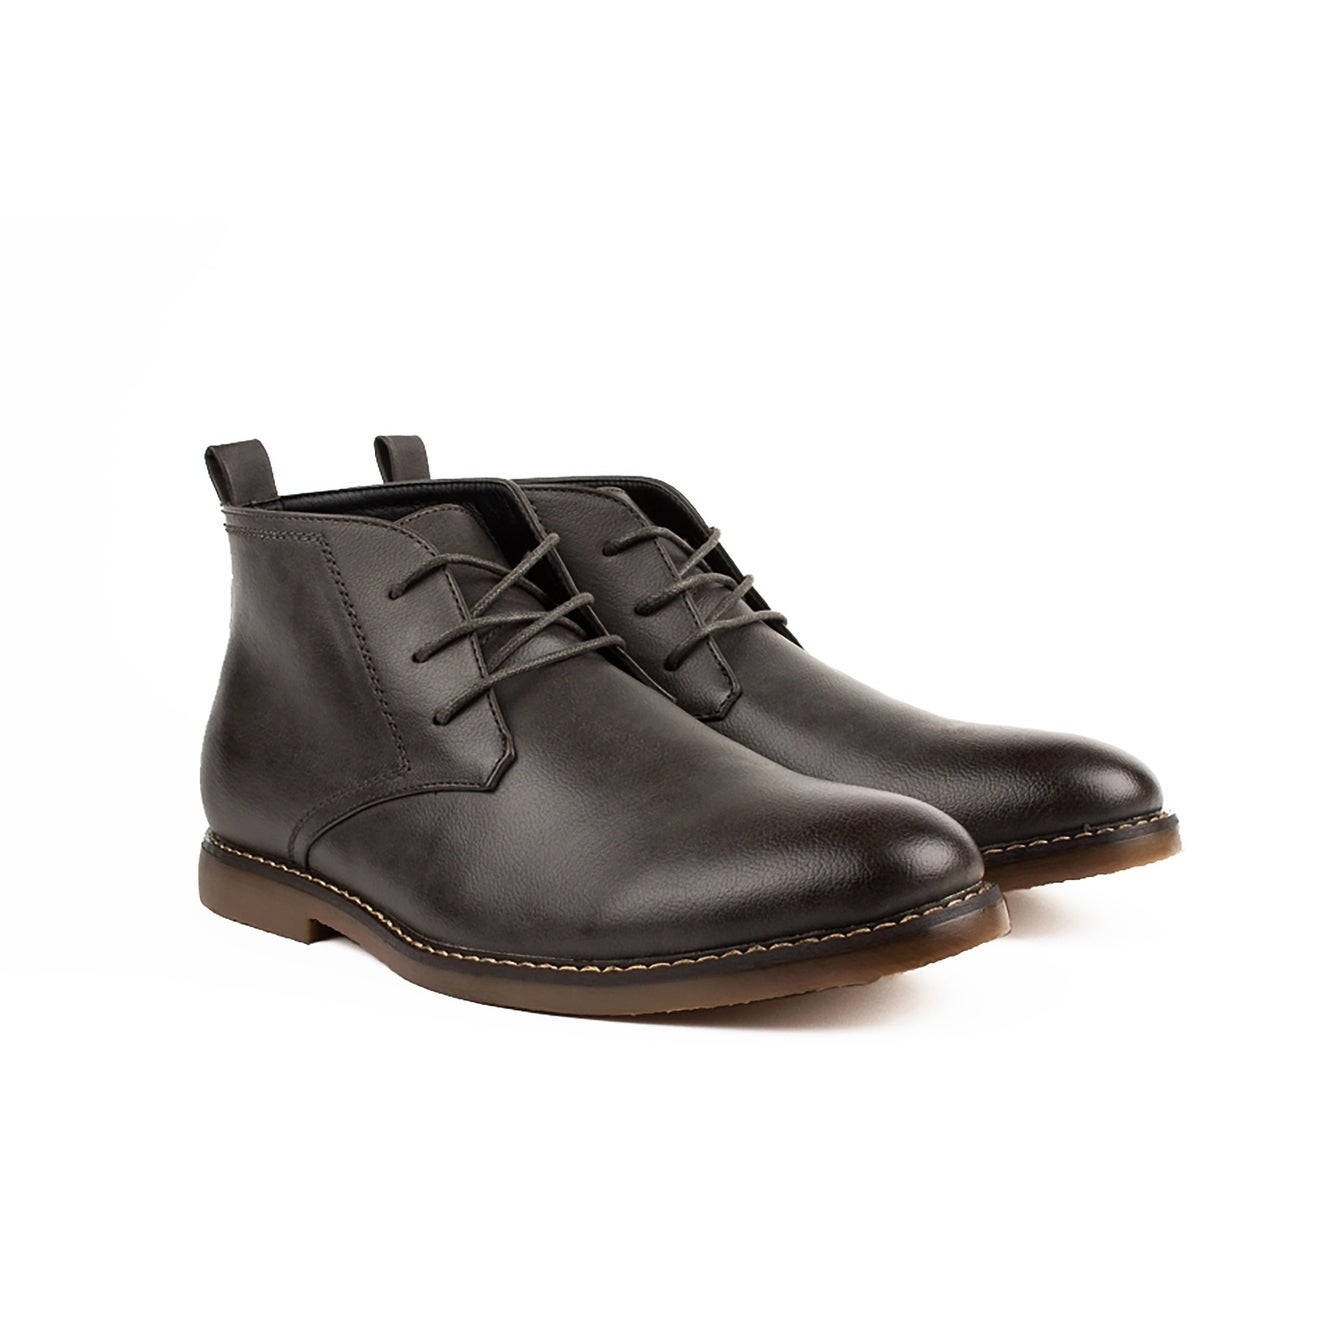 cc64b9df6 Shop Miko Lotti Men's Dress Boot Chukkas - On Sale - Free Shipping Today -  Overstock - 18062634